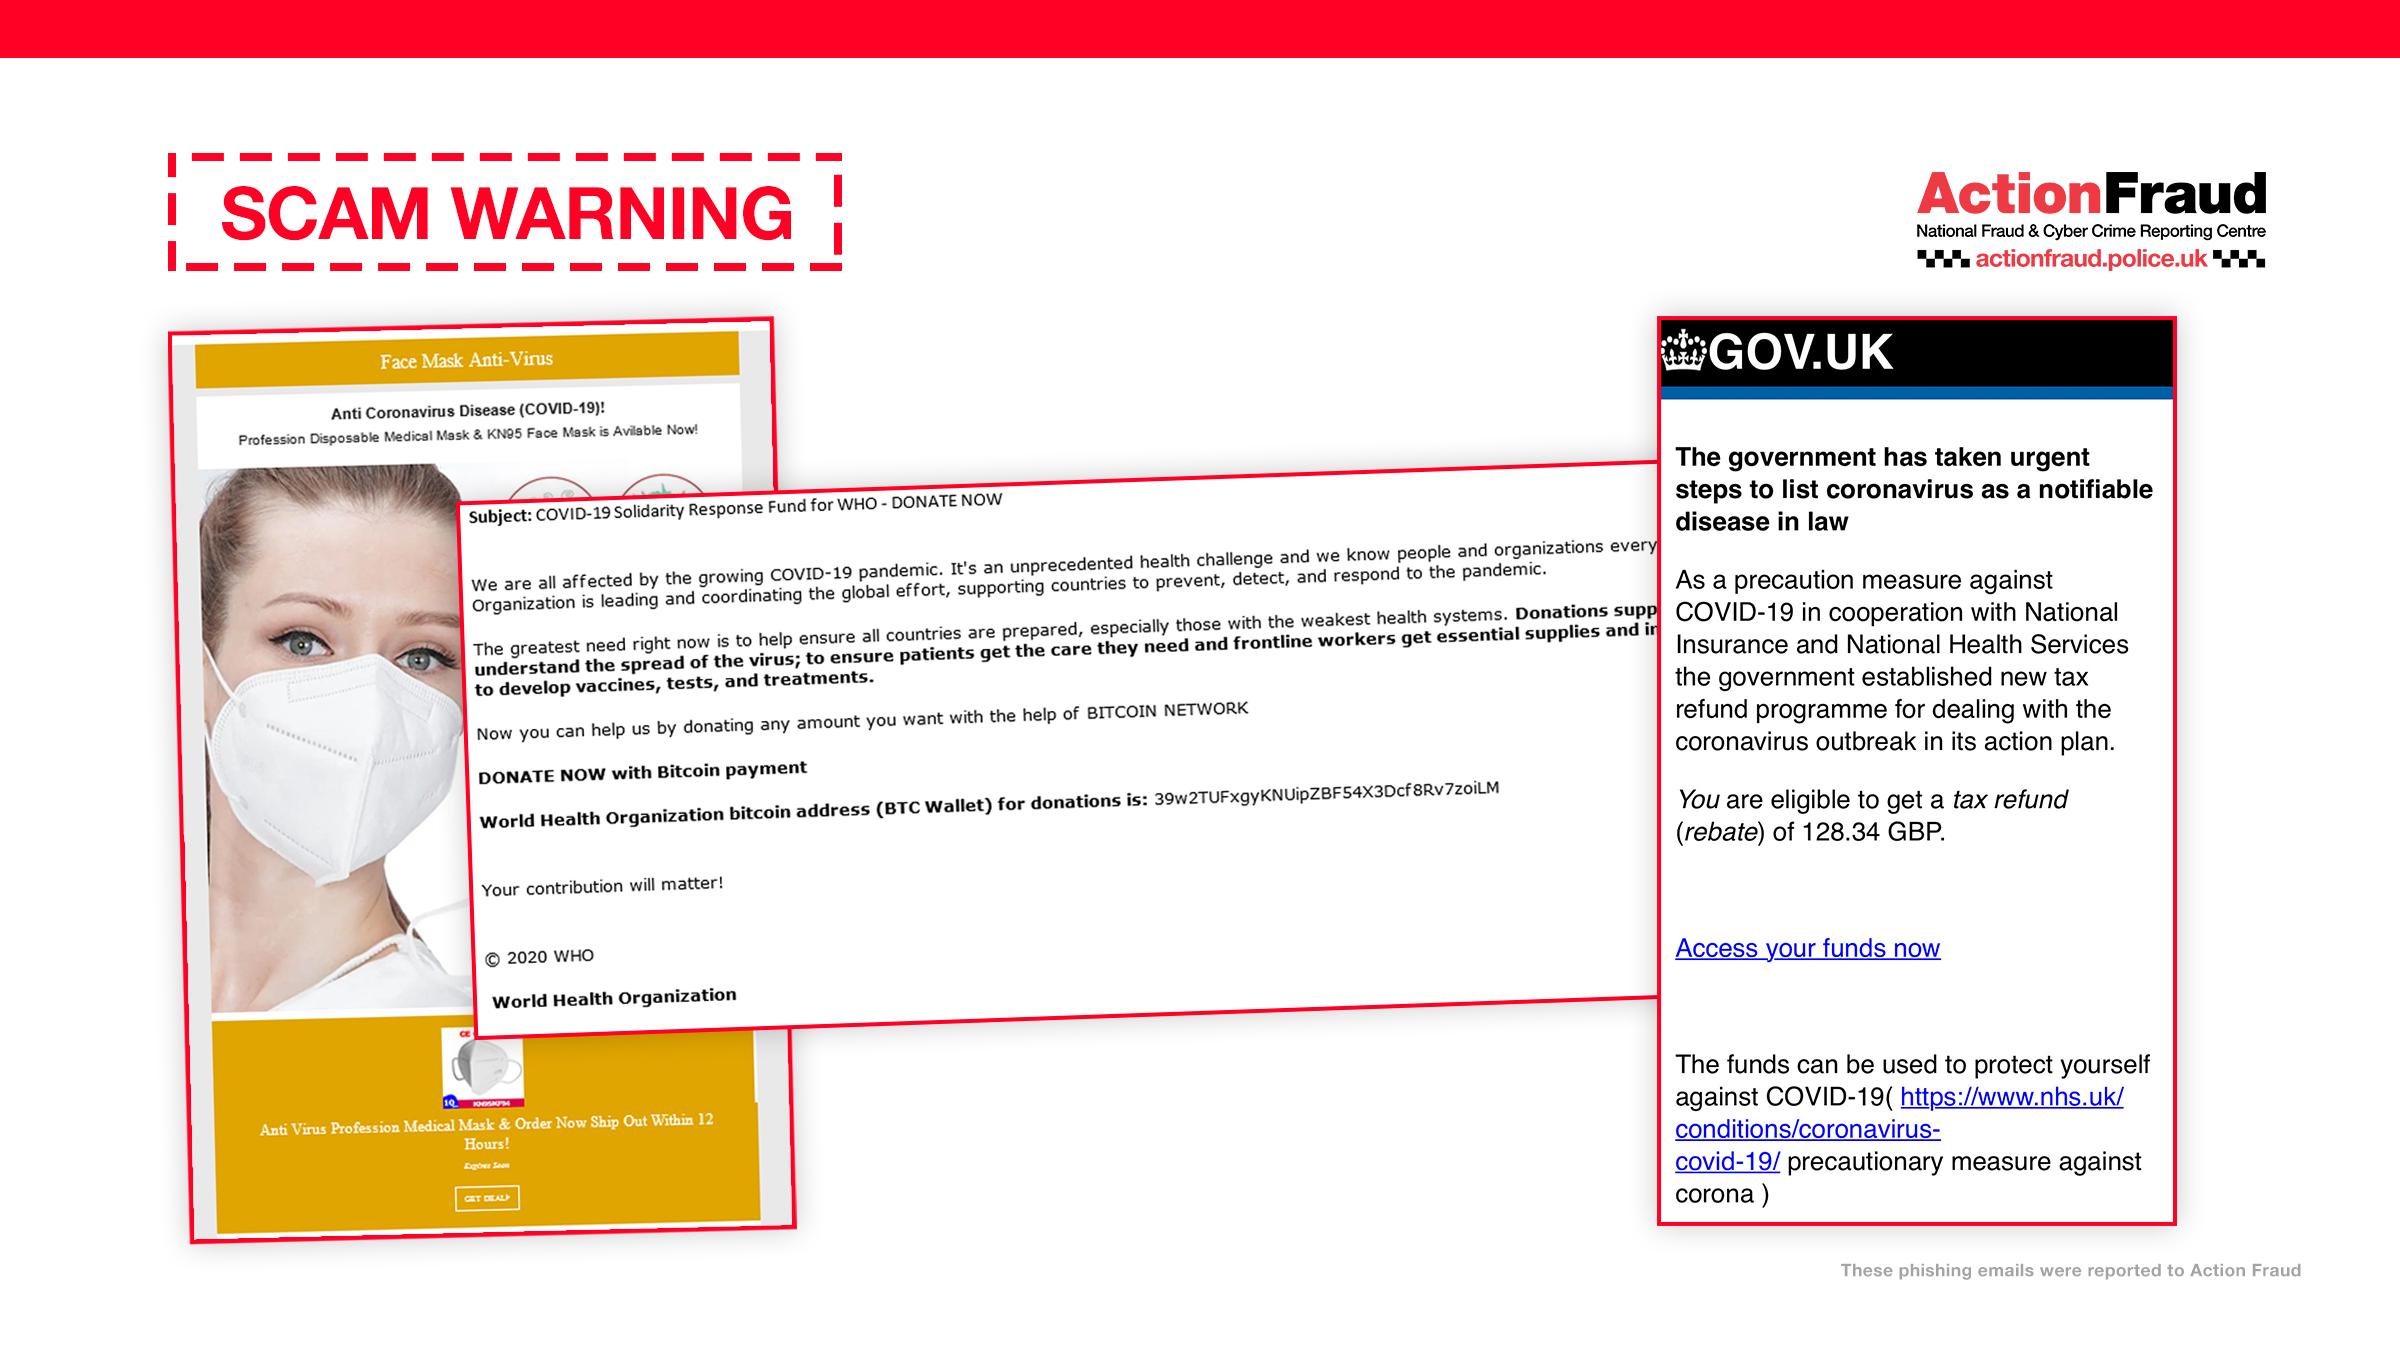 Online Fraud West Yorkshire Police